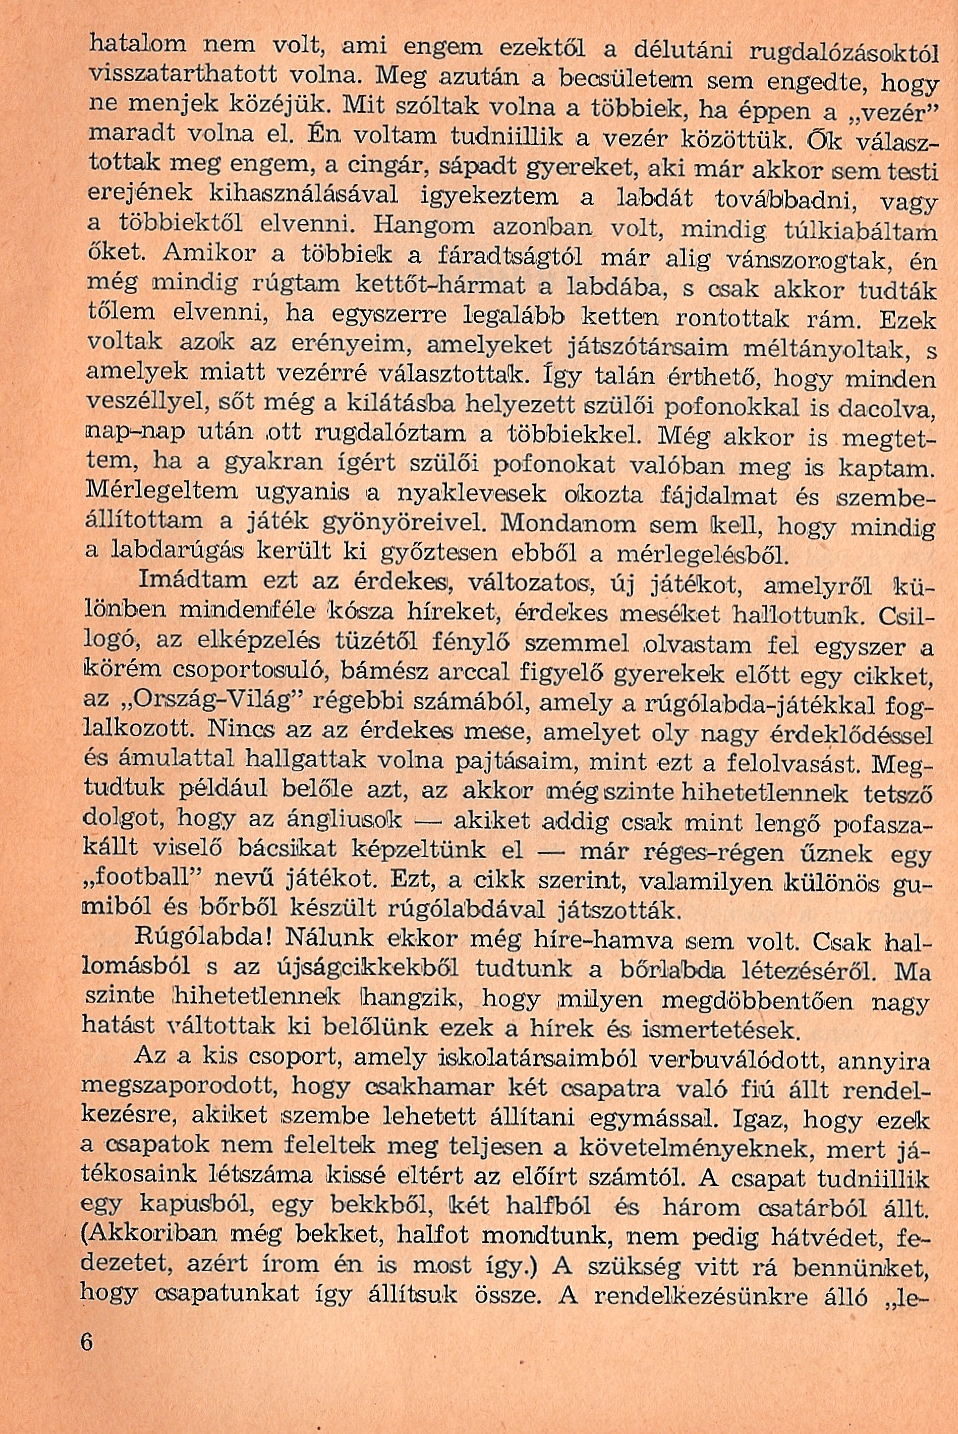 schlosser_fel-evszazad_1957_06_0903